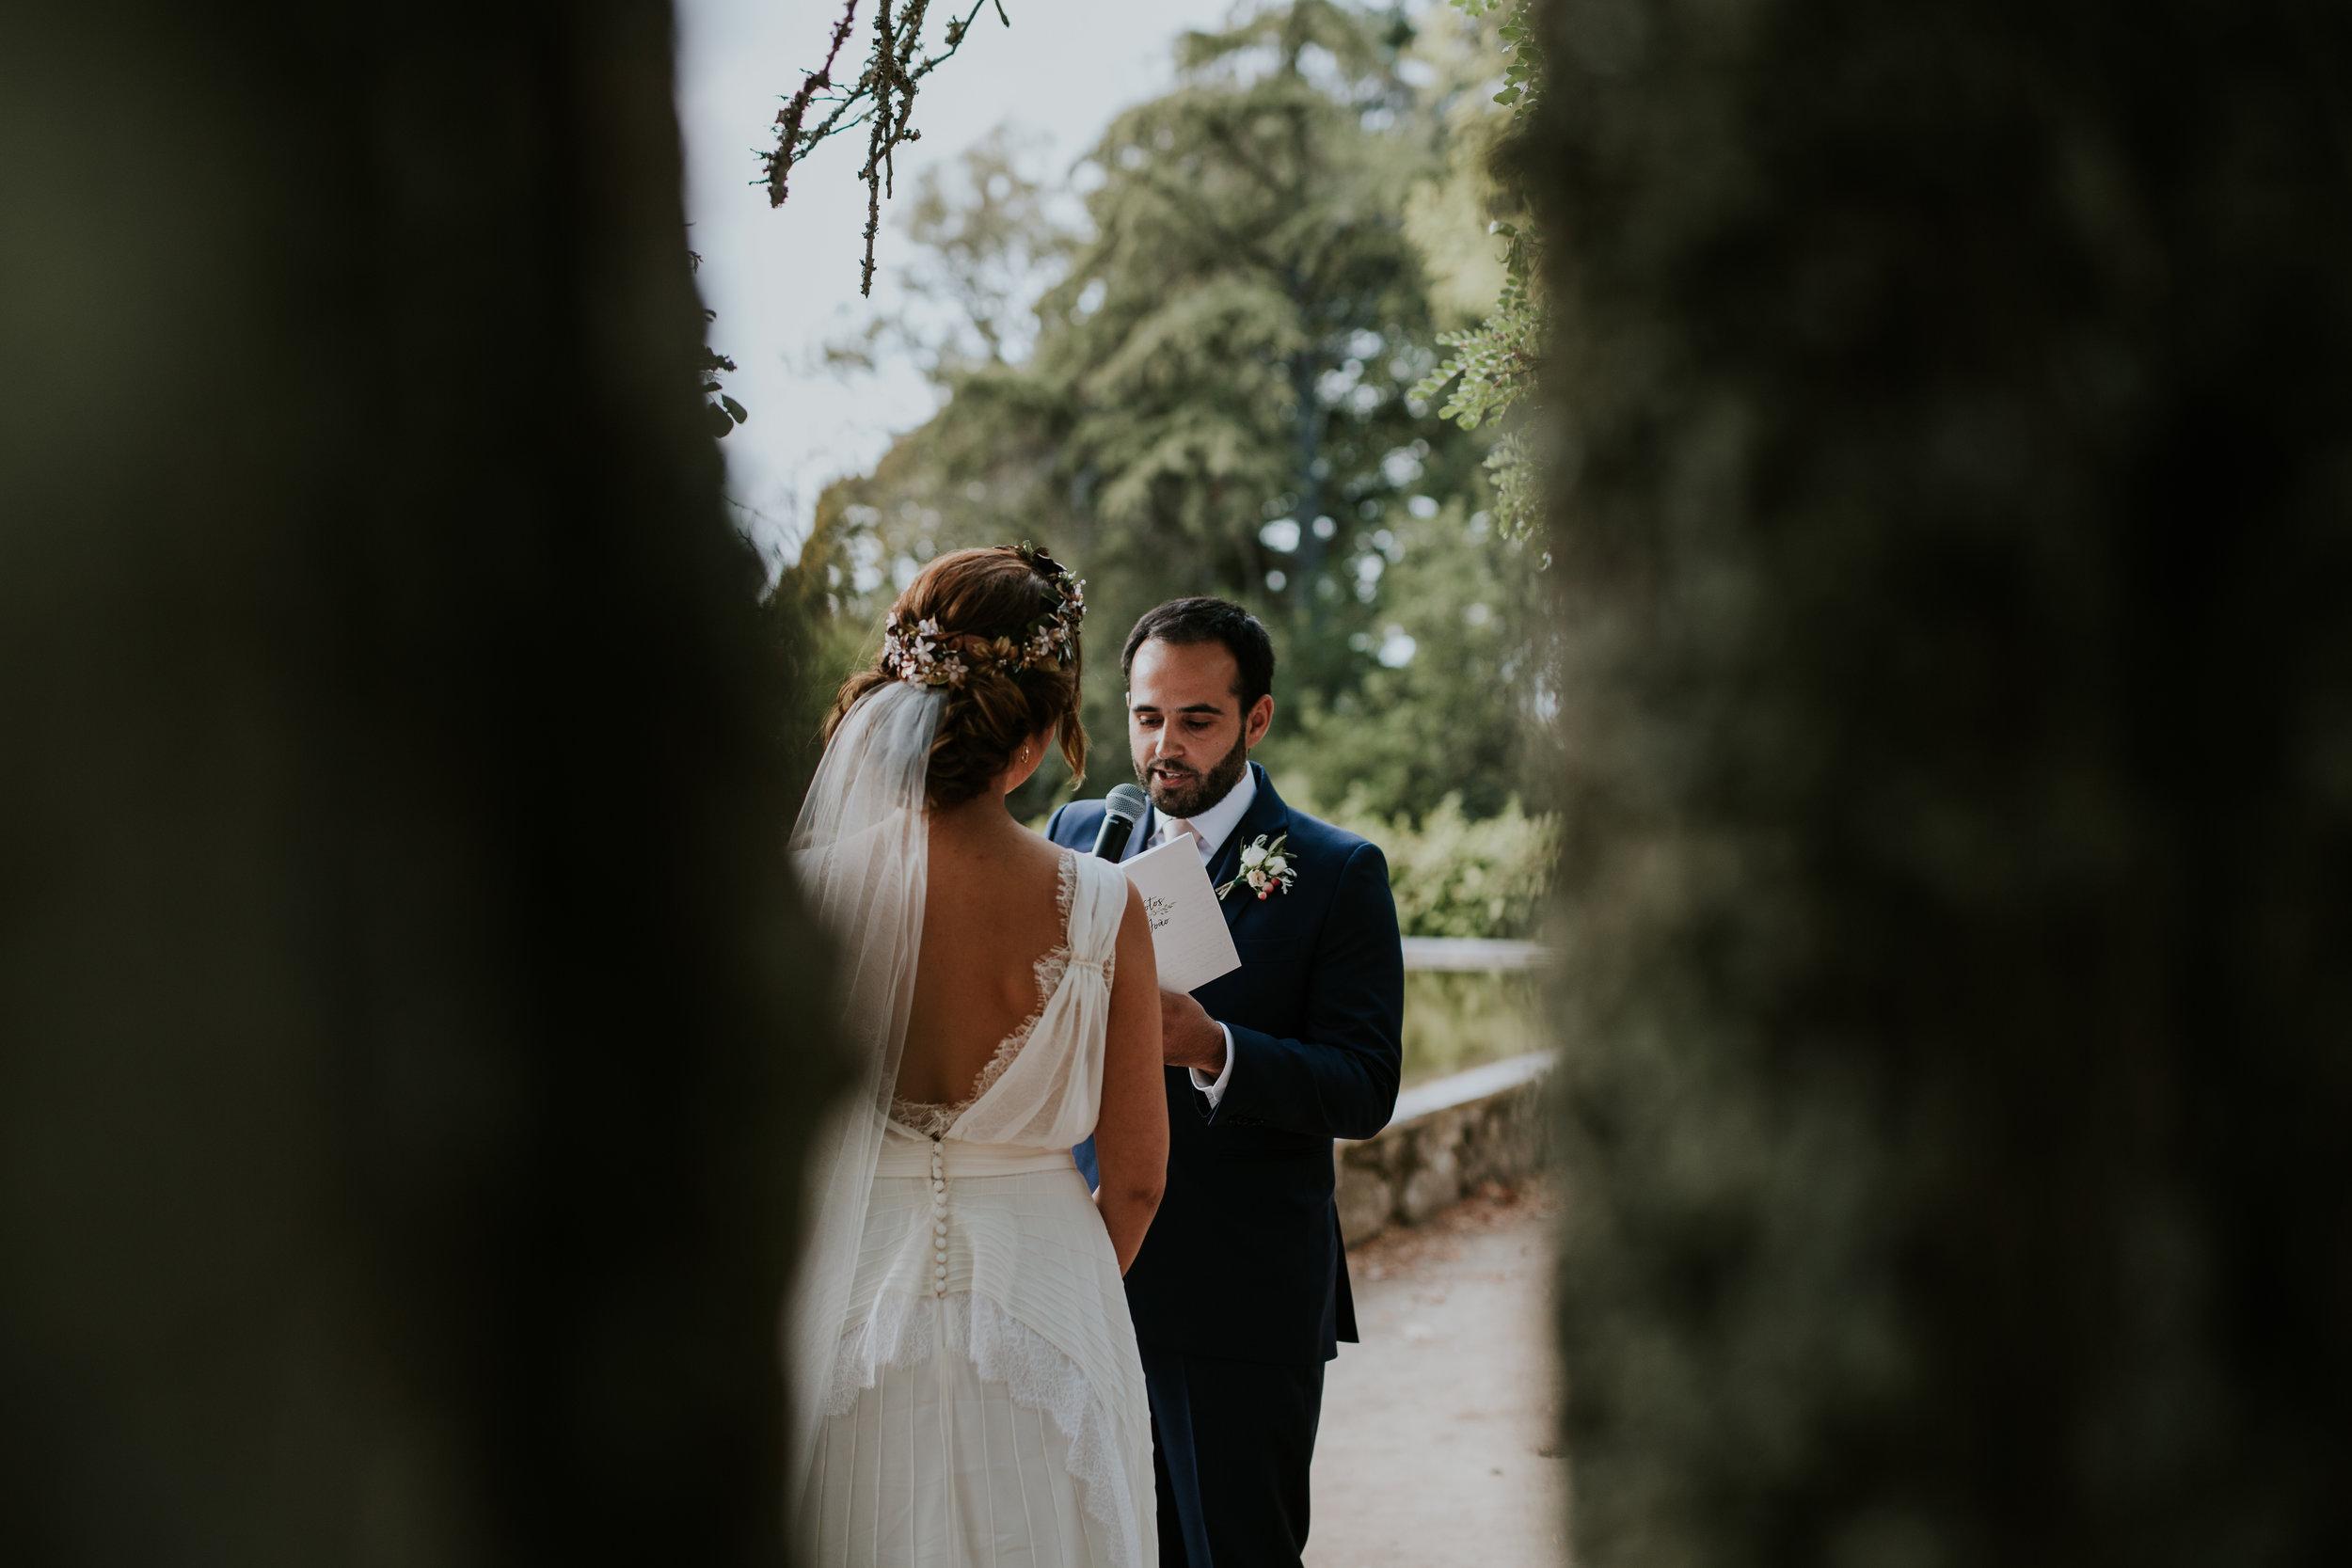 R&J285_ 09 setembro 2017 Wedding day_.jpg